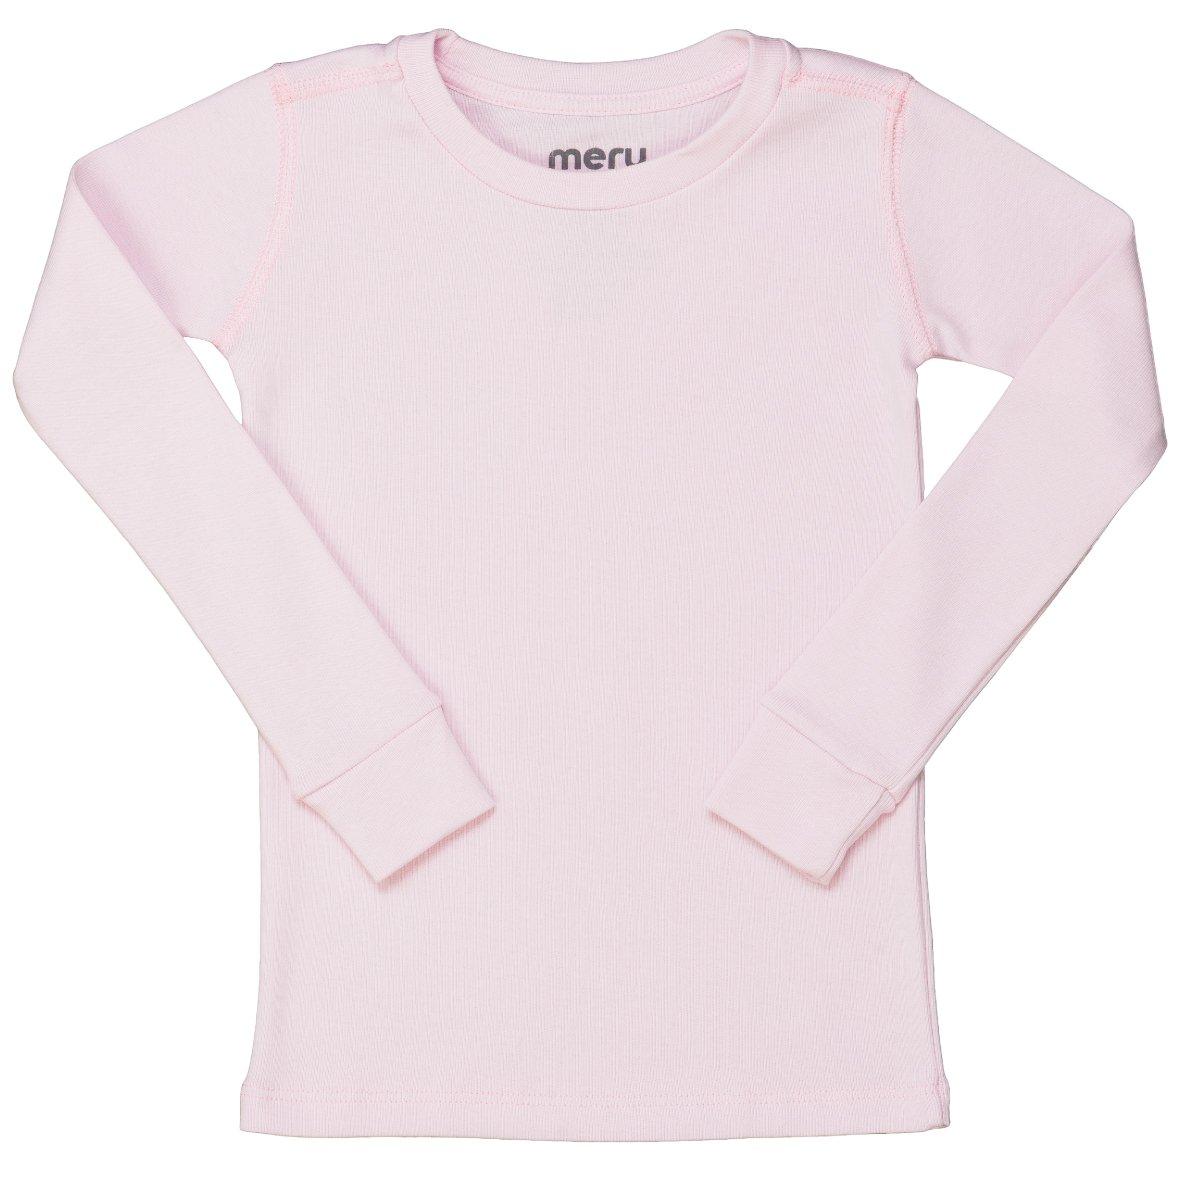 Meru Girls Solid Color Pajama Top